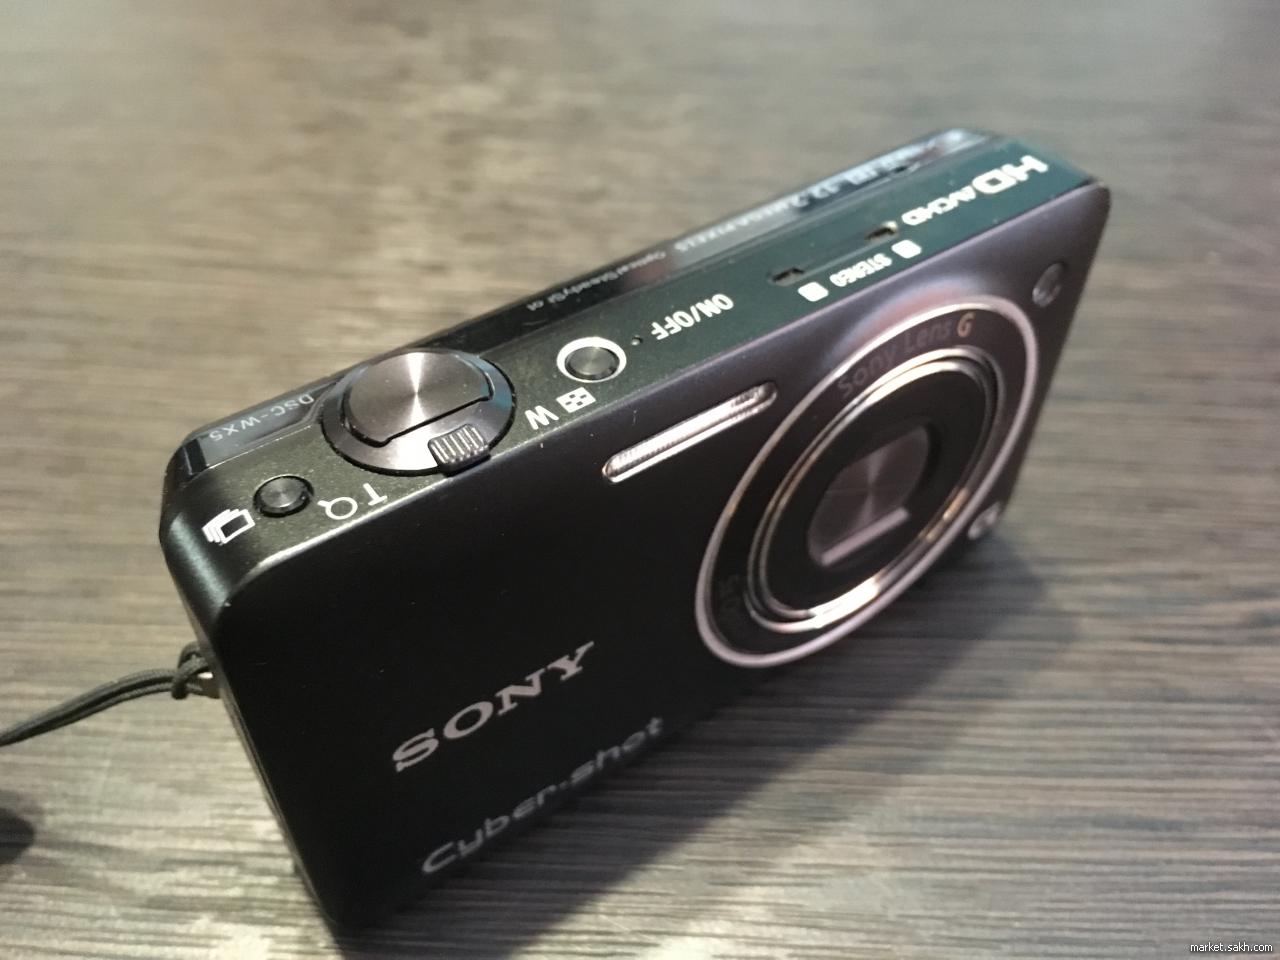 Sony cyber shot programa baixar fotos 2